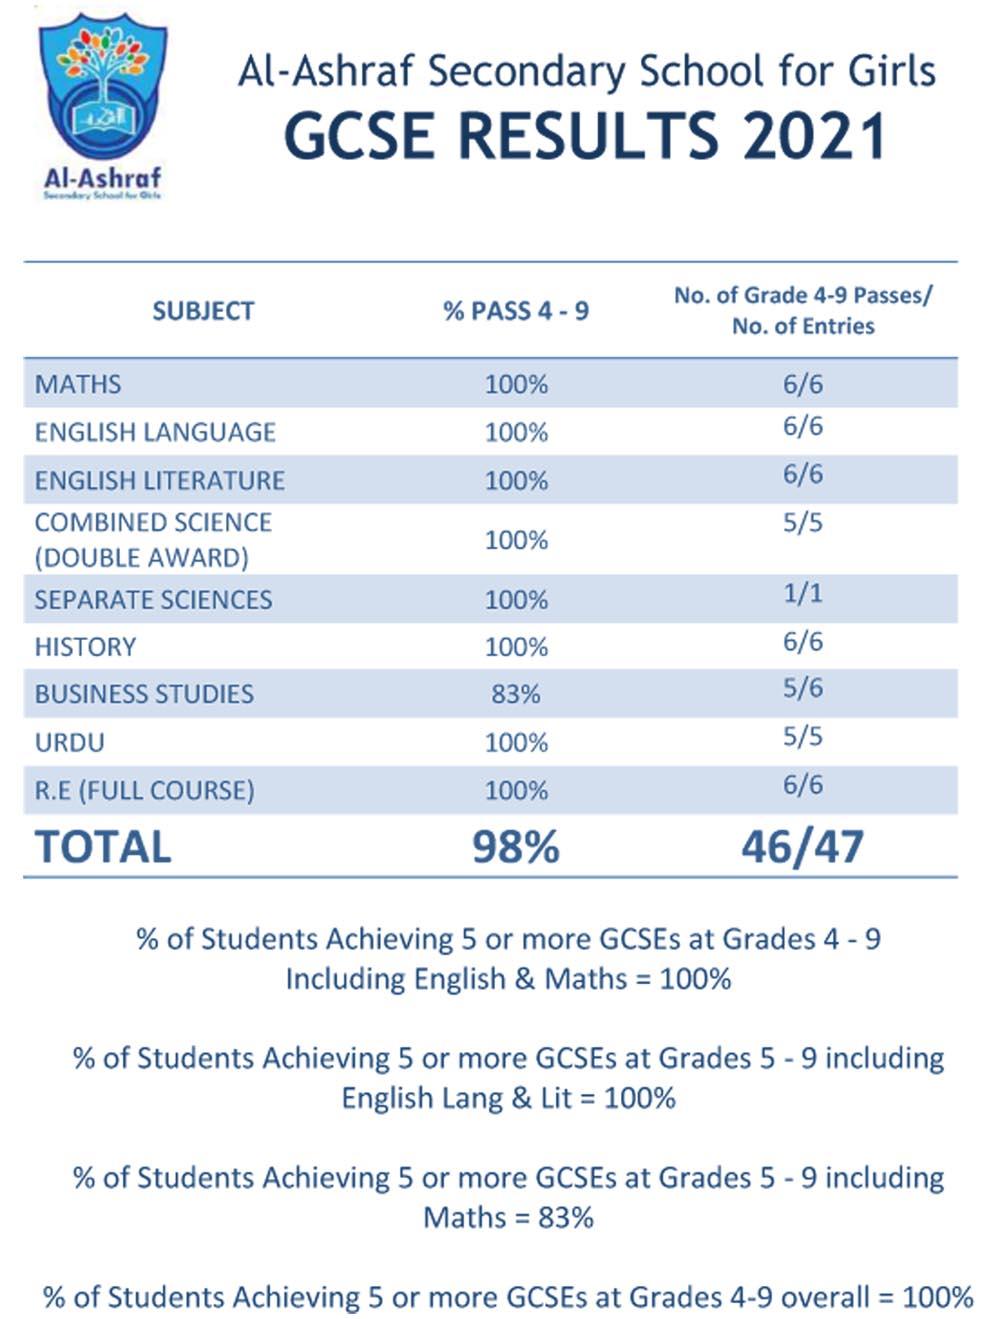 GCSE Results 2021